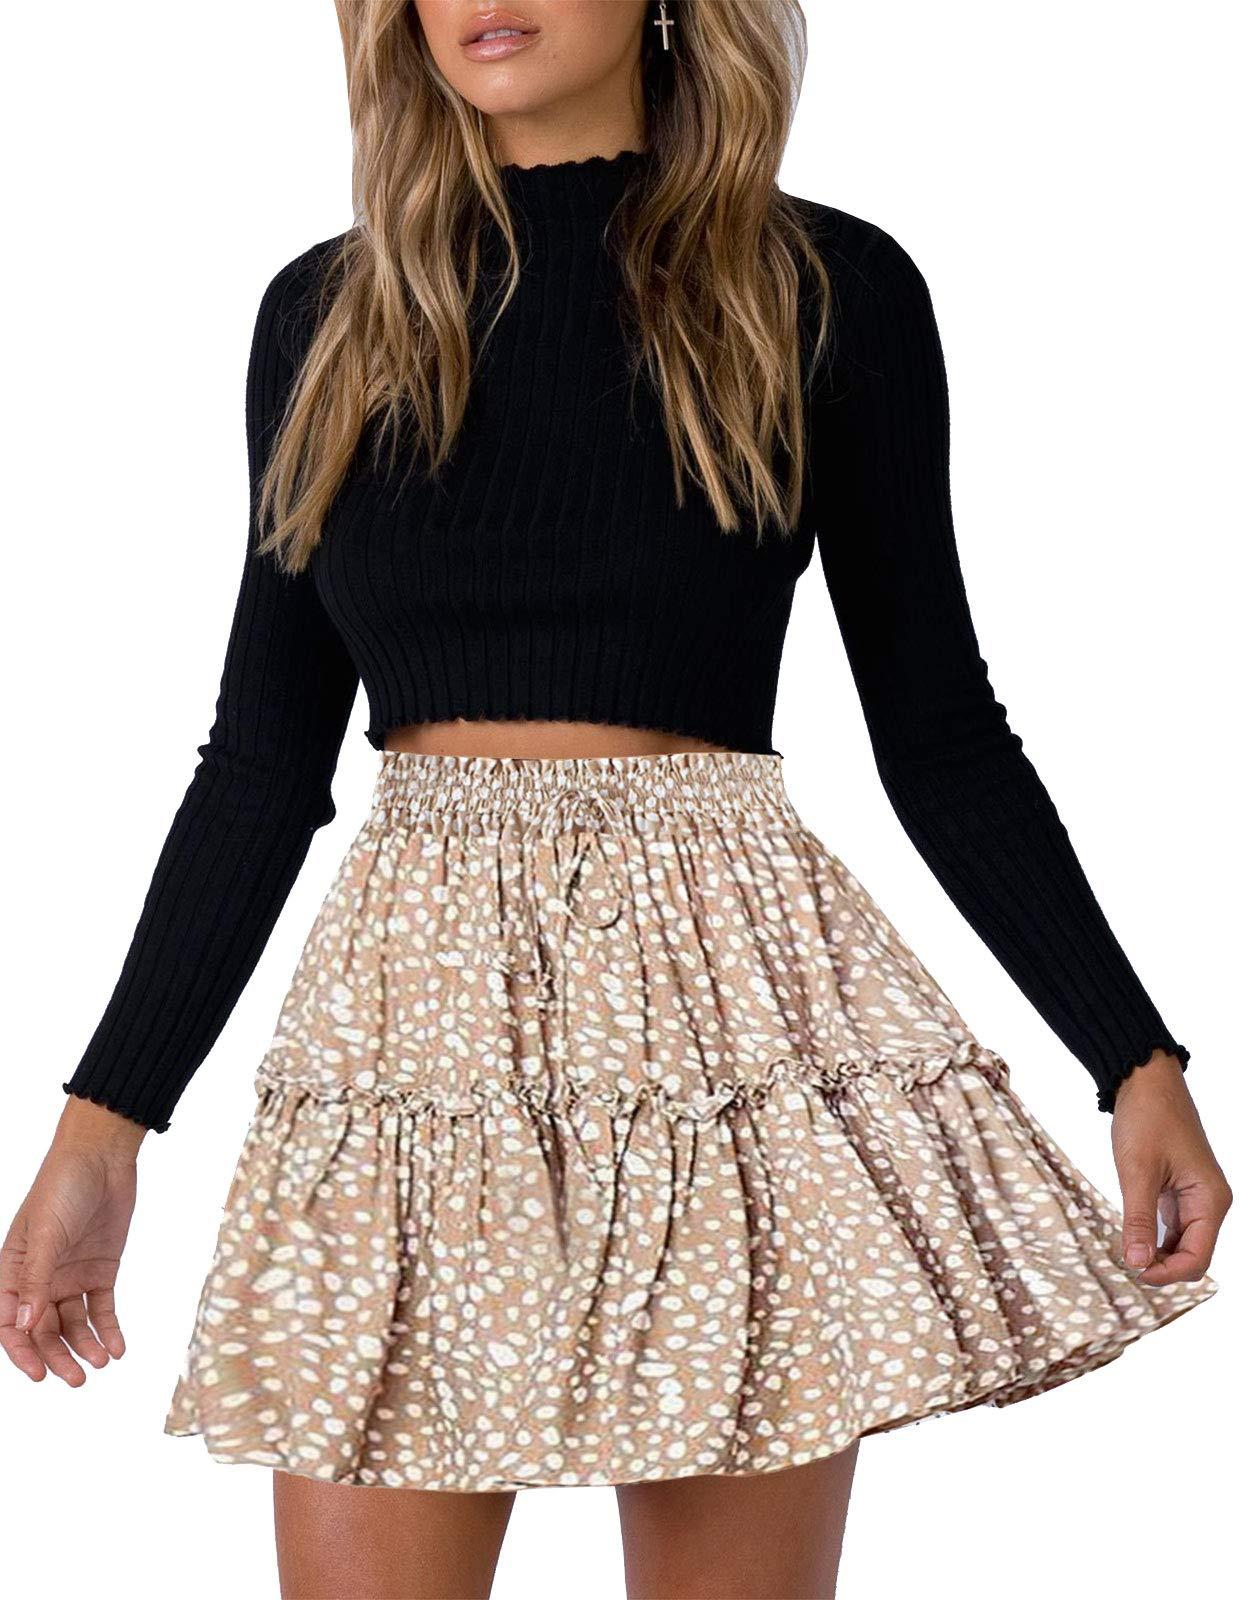 Women Mini Skirt High Waist Drawstring Ruffle Flared Swing Pleated A-Line Skirts